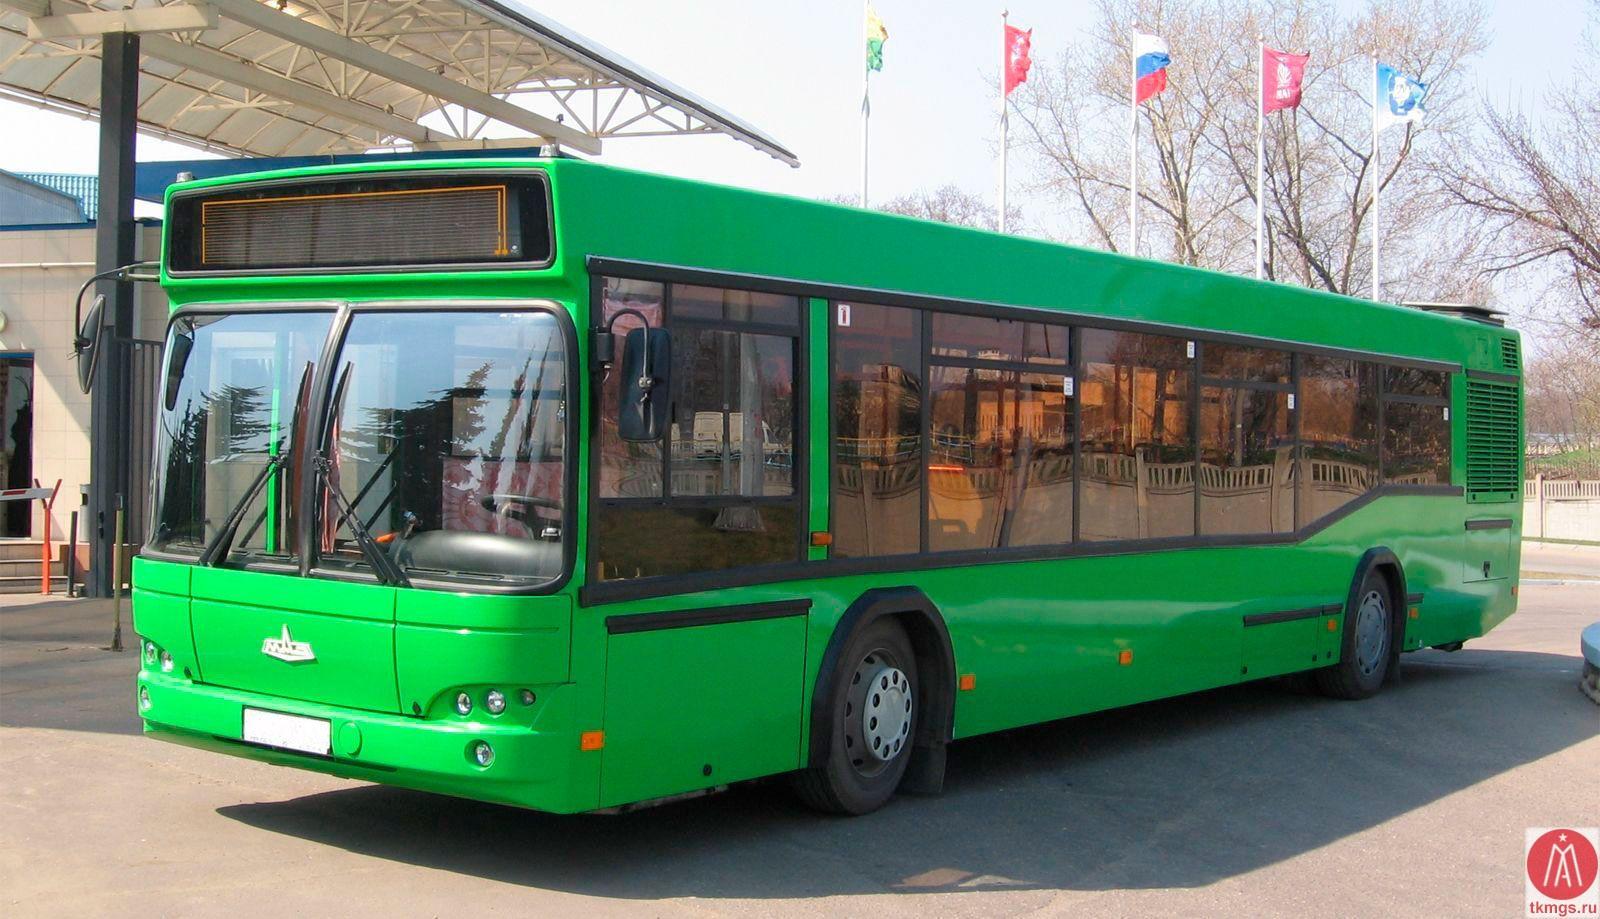 МАЗ 103565 - Вид сбоку автобуса